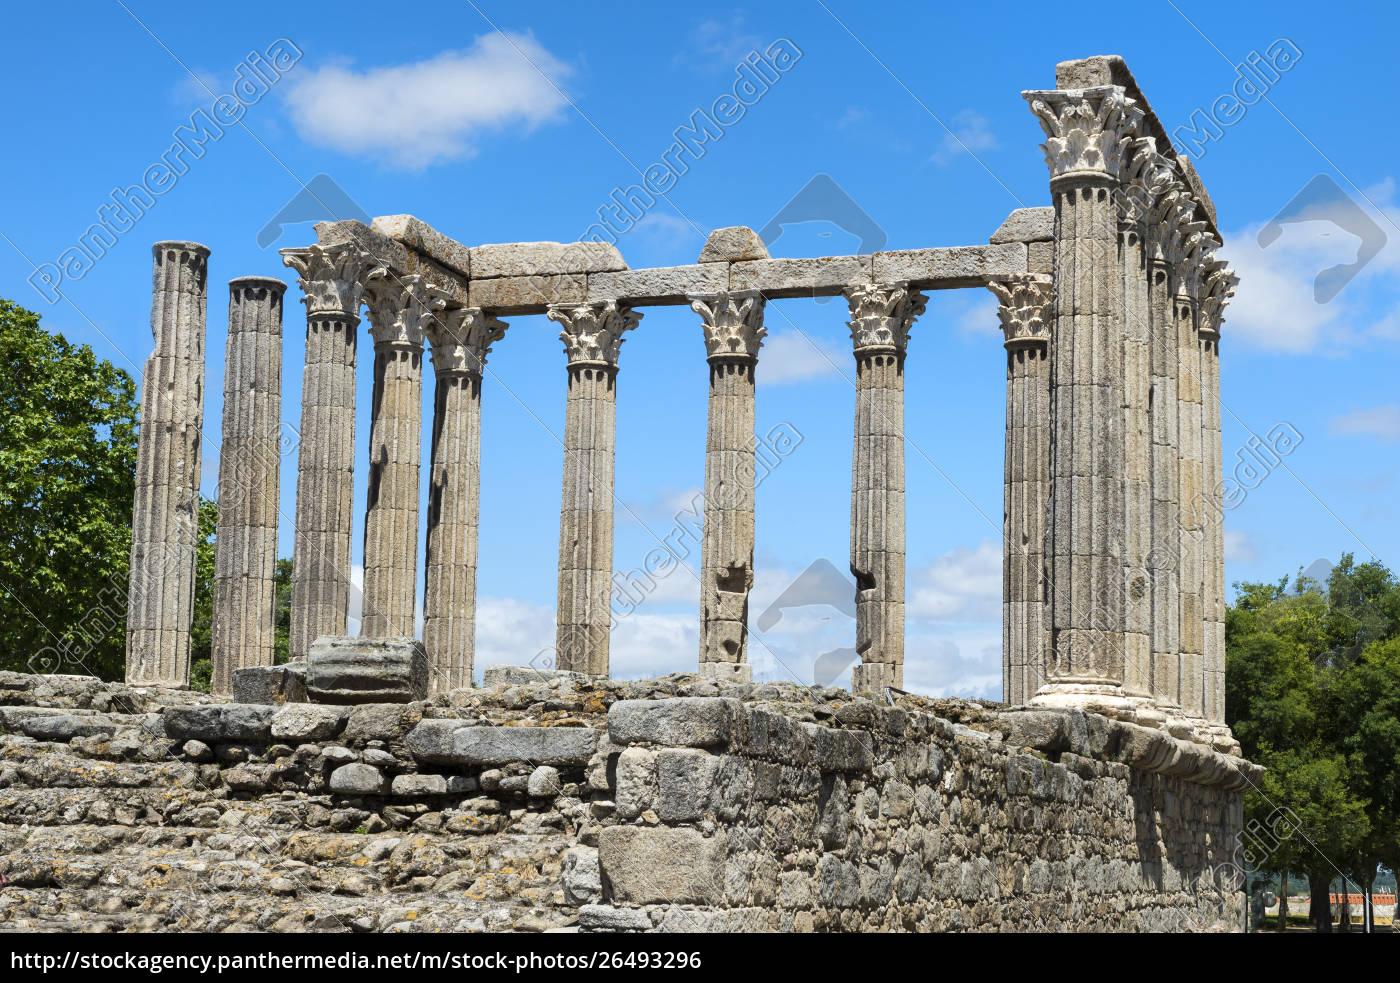 templo, romano, de, diana, patrimonio, mundial, de - 26493296